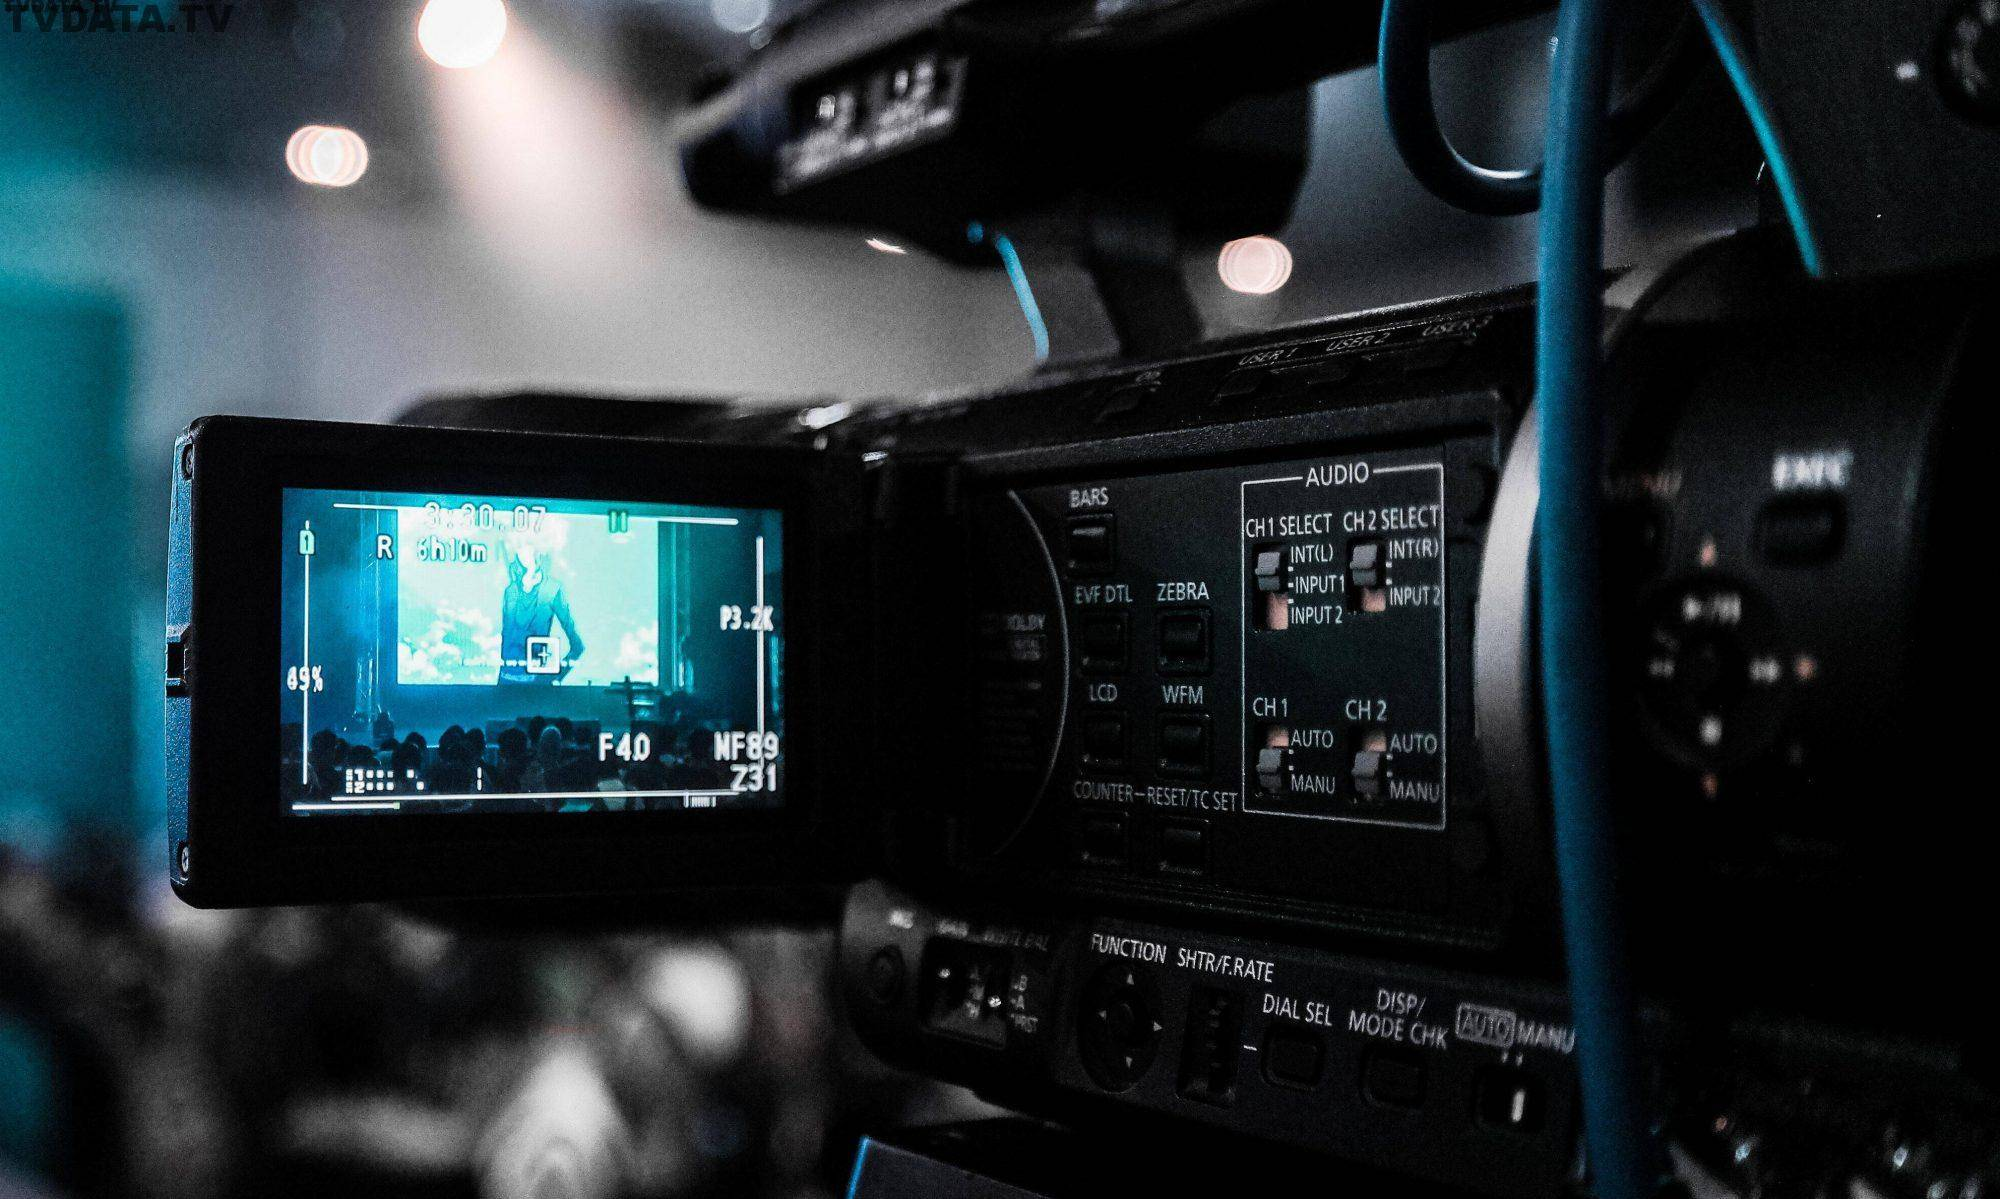 TVDATA.TV Media Services